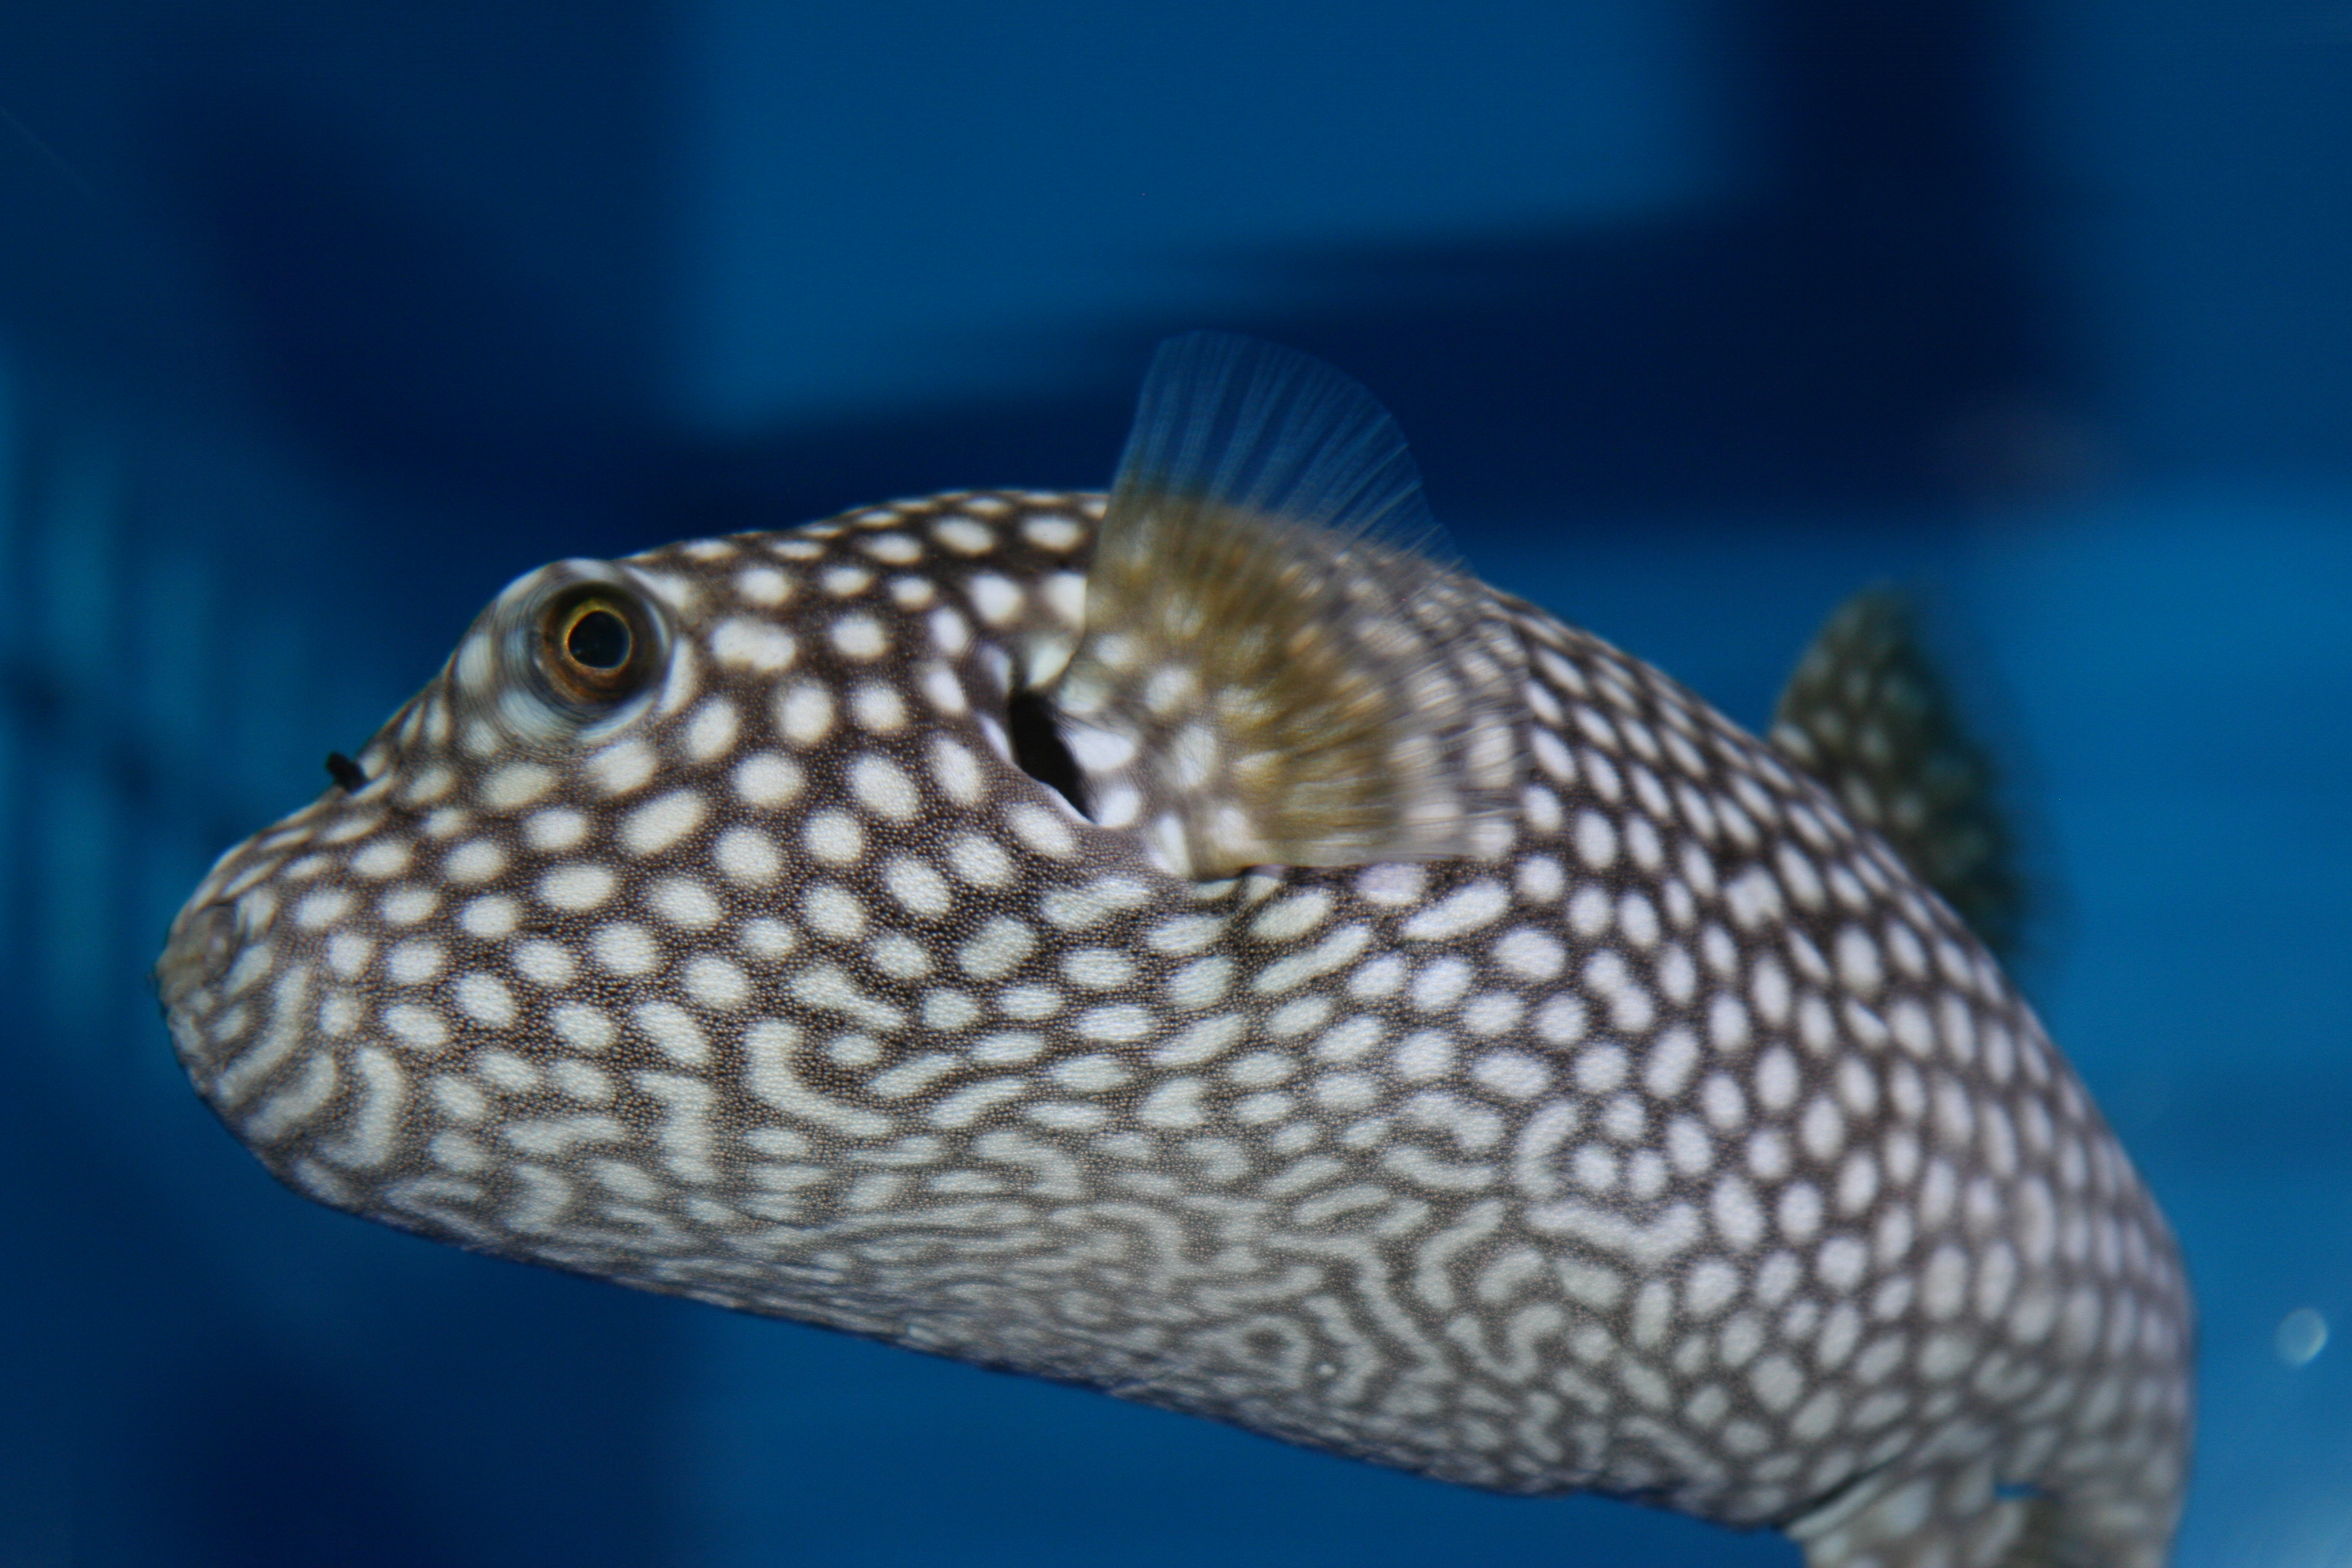 Finding water at the arizona sonora desert museum aquarium for Puffer fish florida